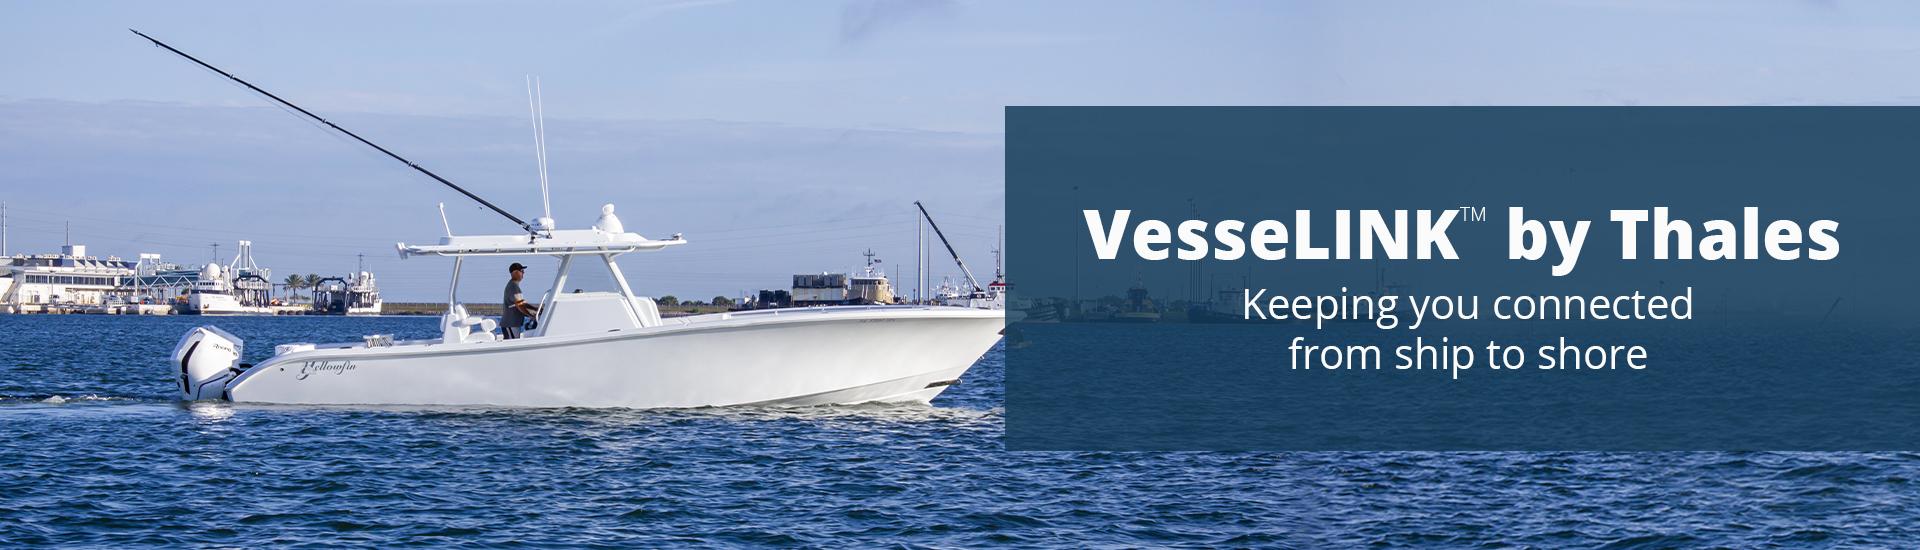 VesseLINK by Thales